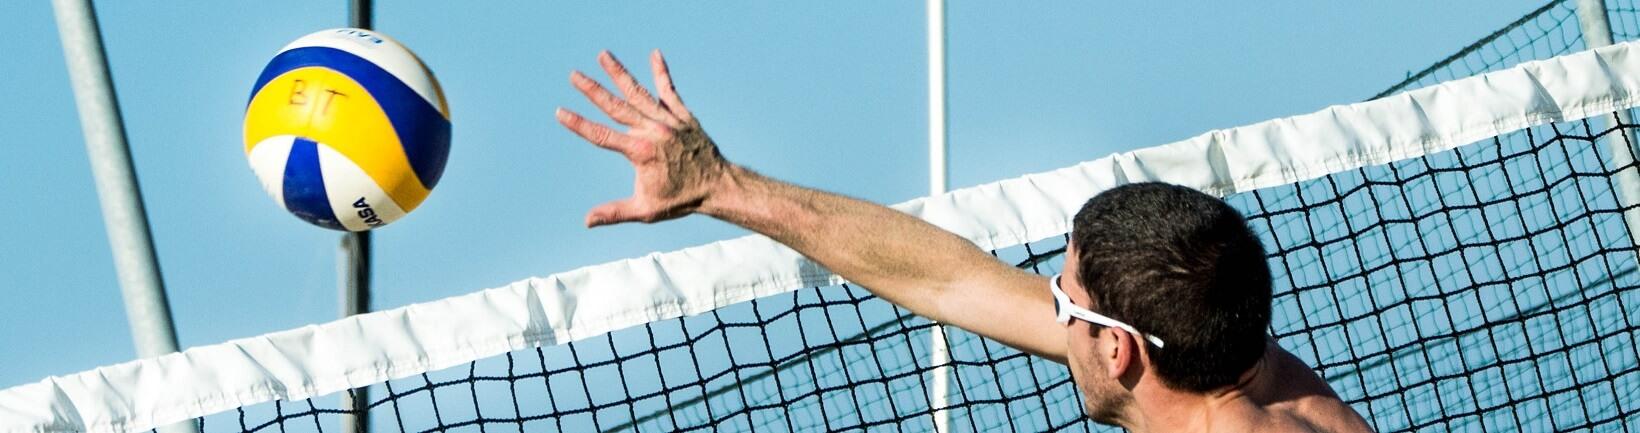 Redes deportivas a medida. Volleyball